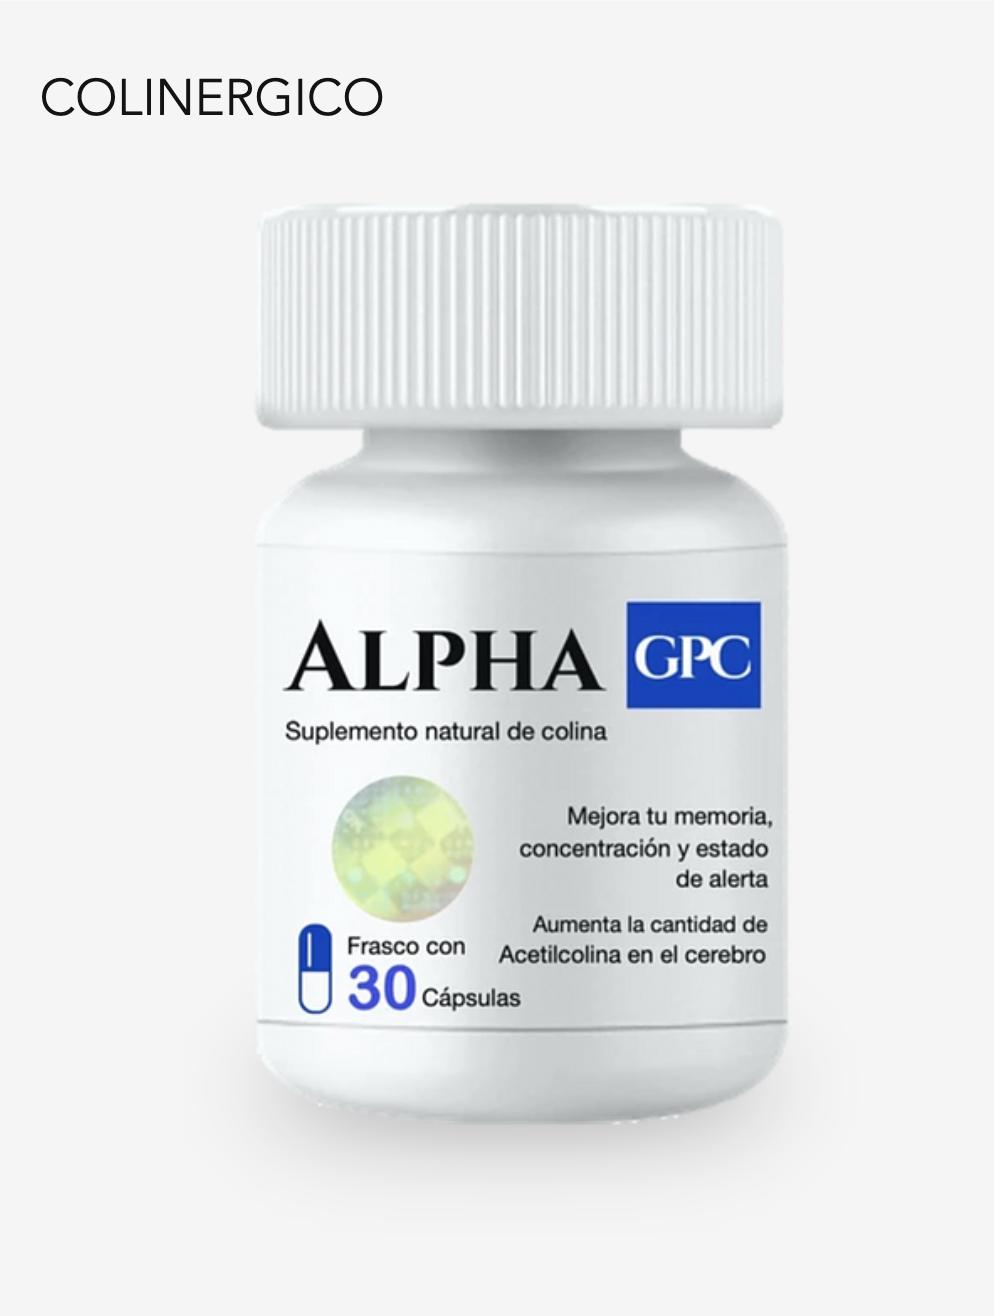 alfa gpc coline